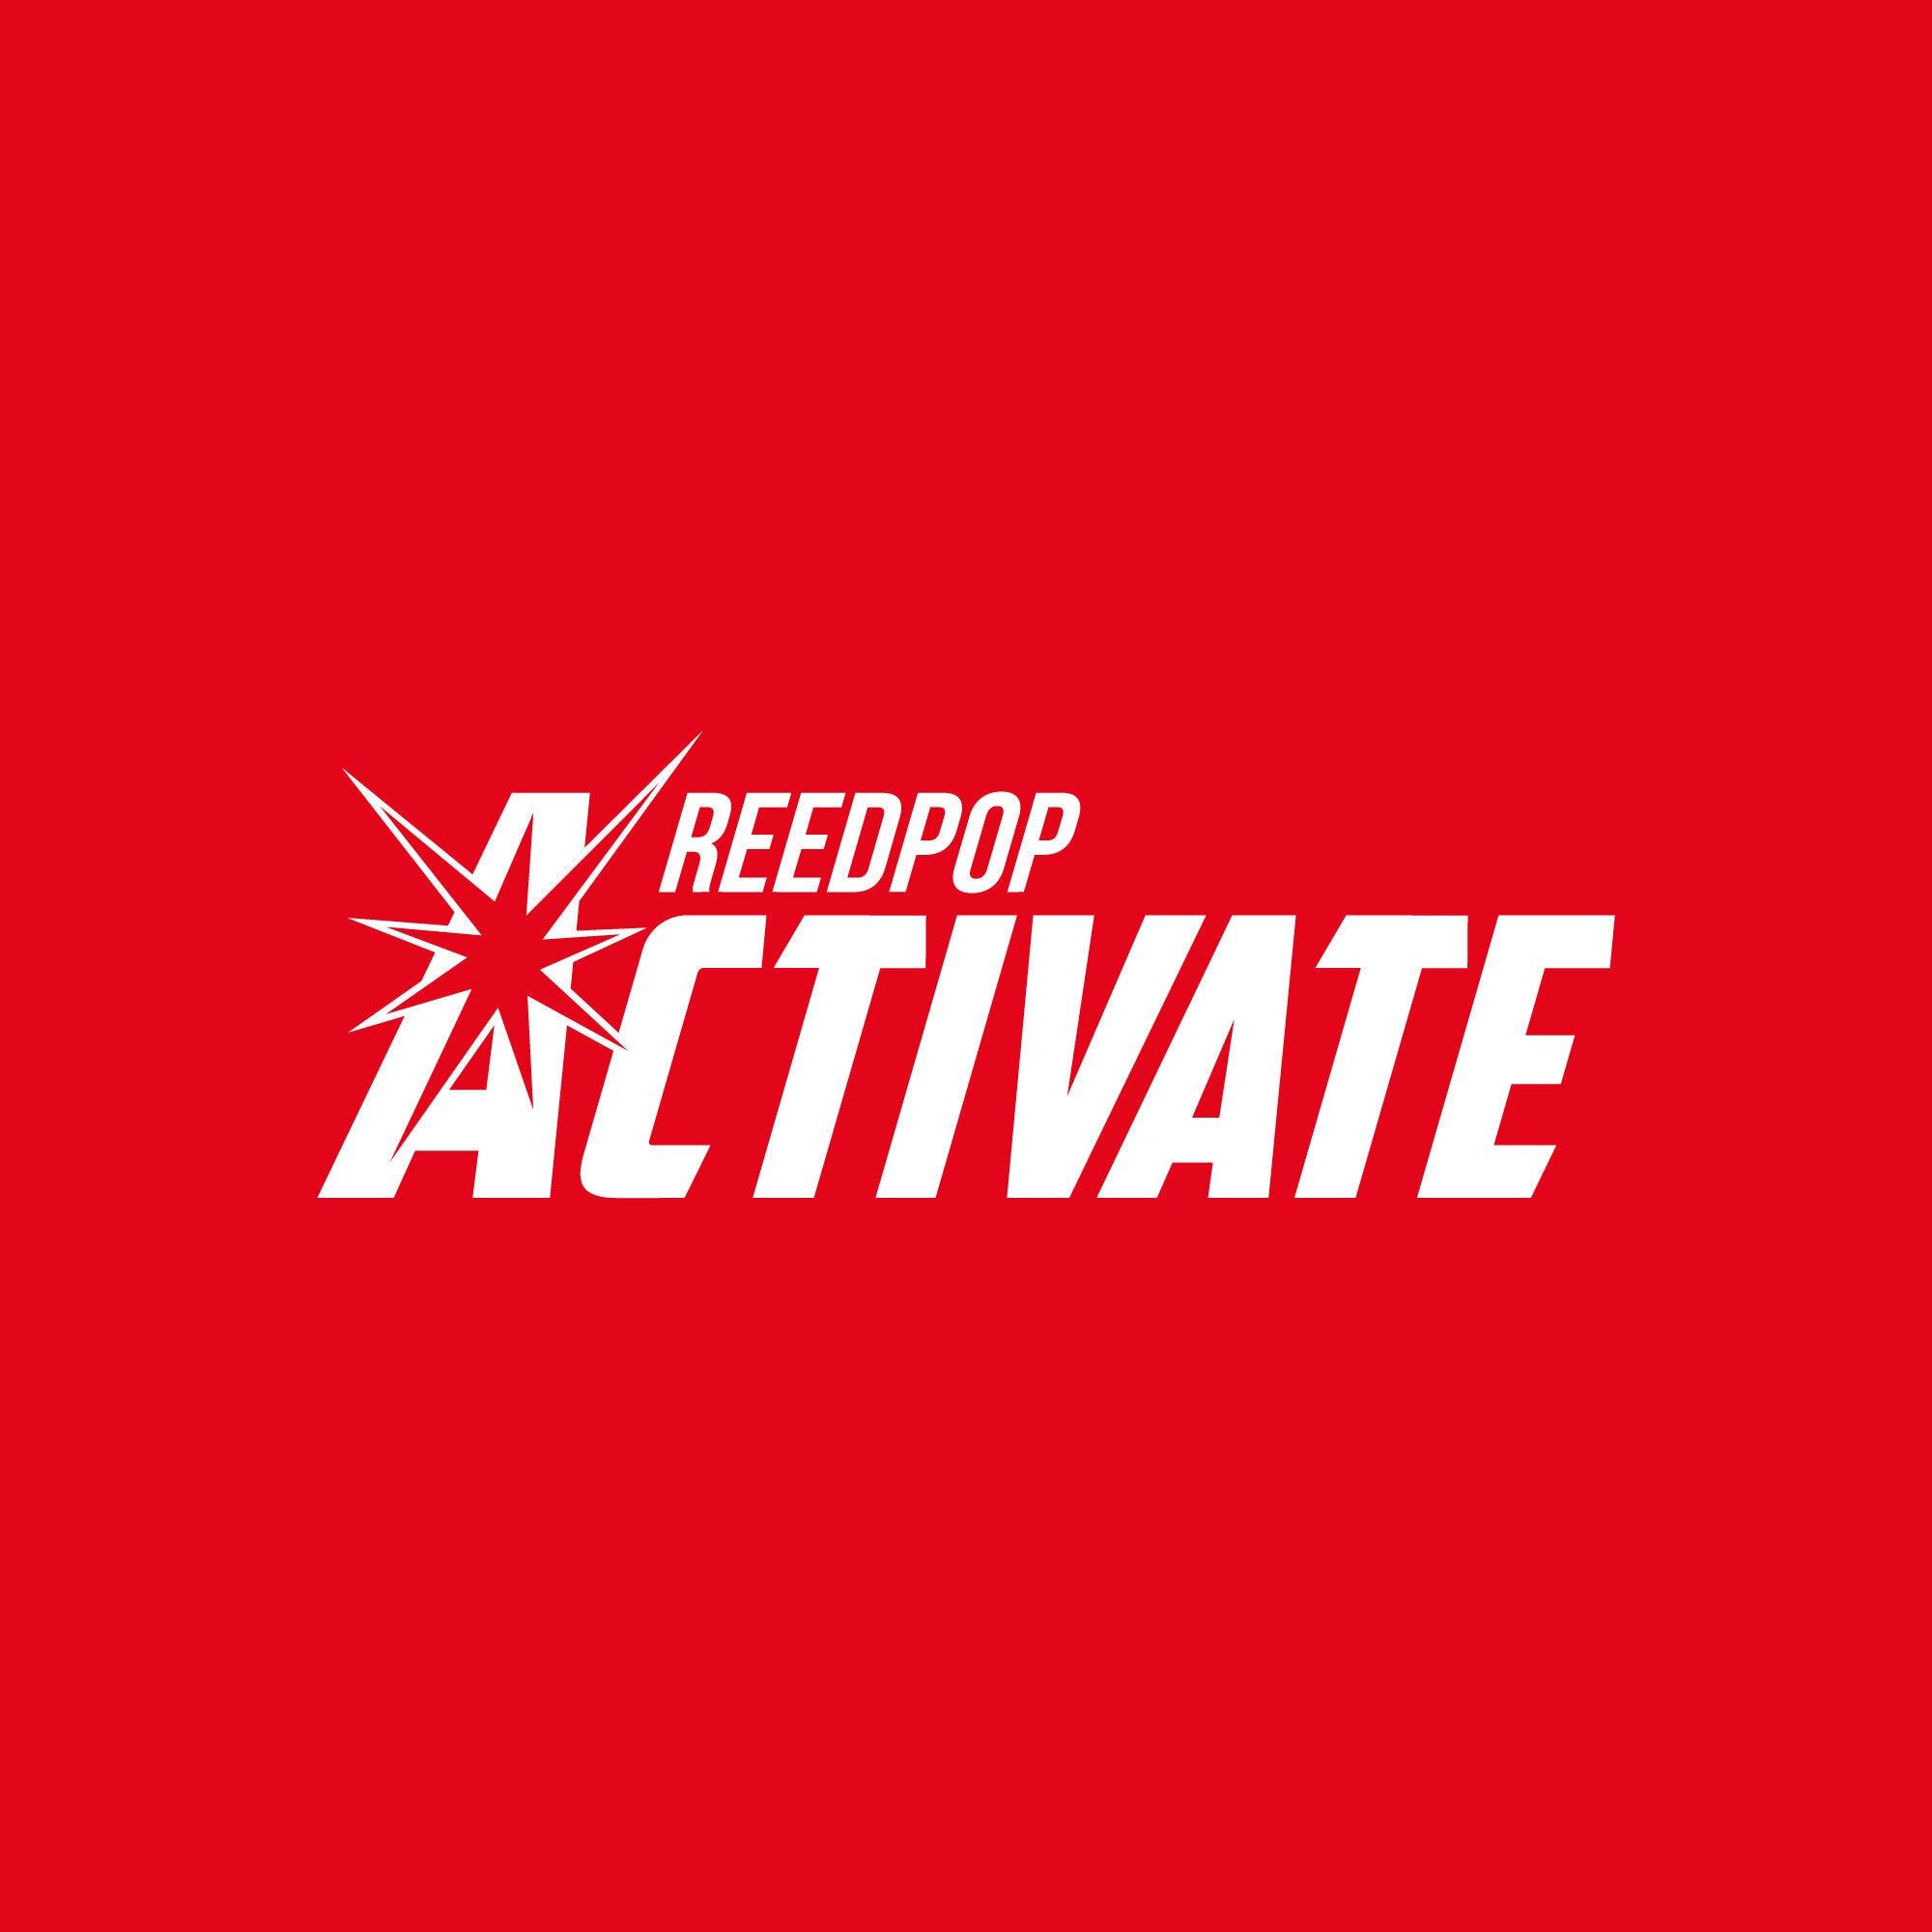 ReedPop Activate thumbnail